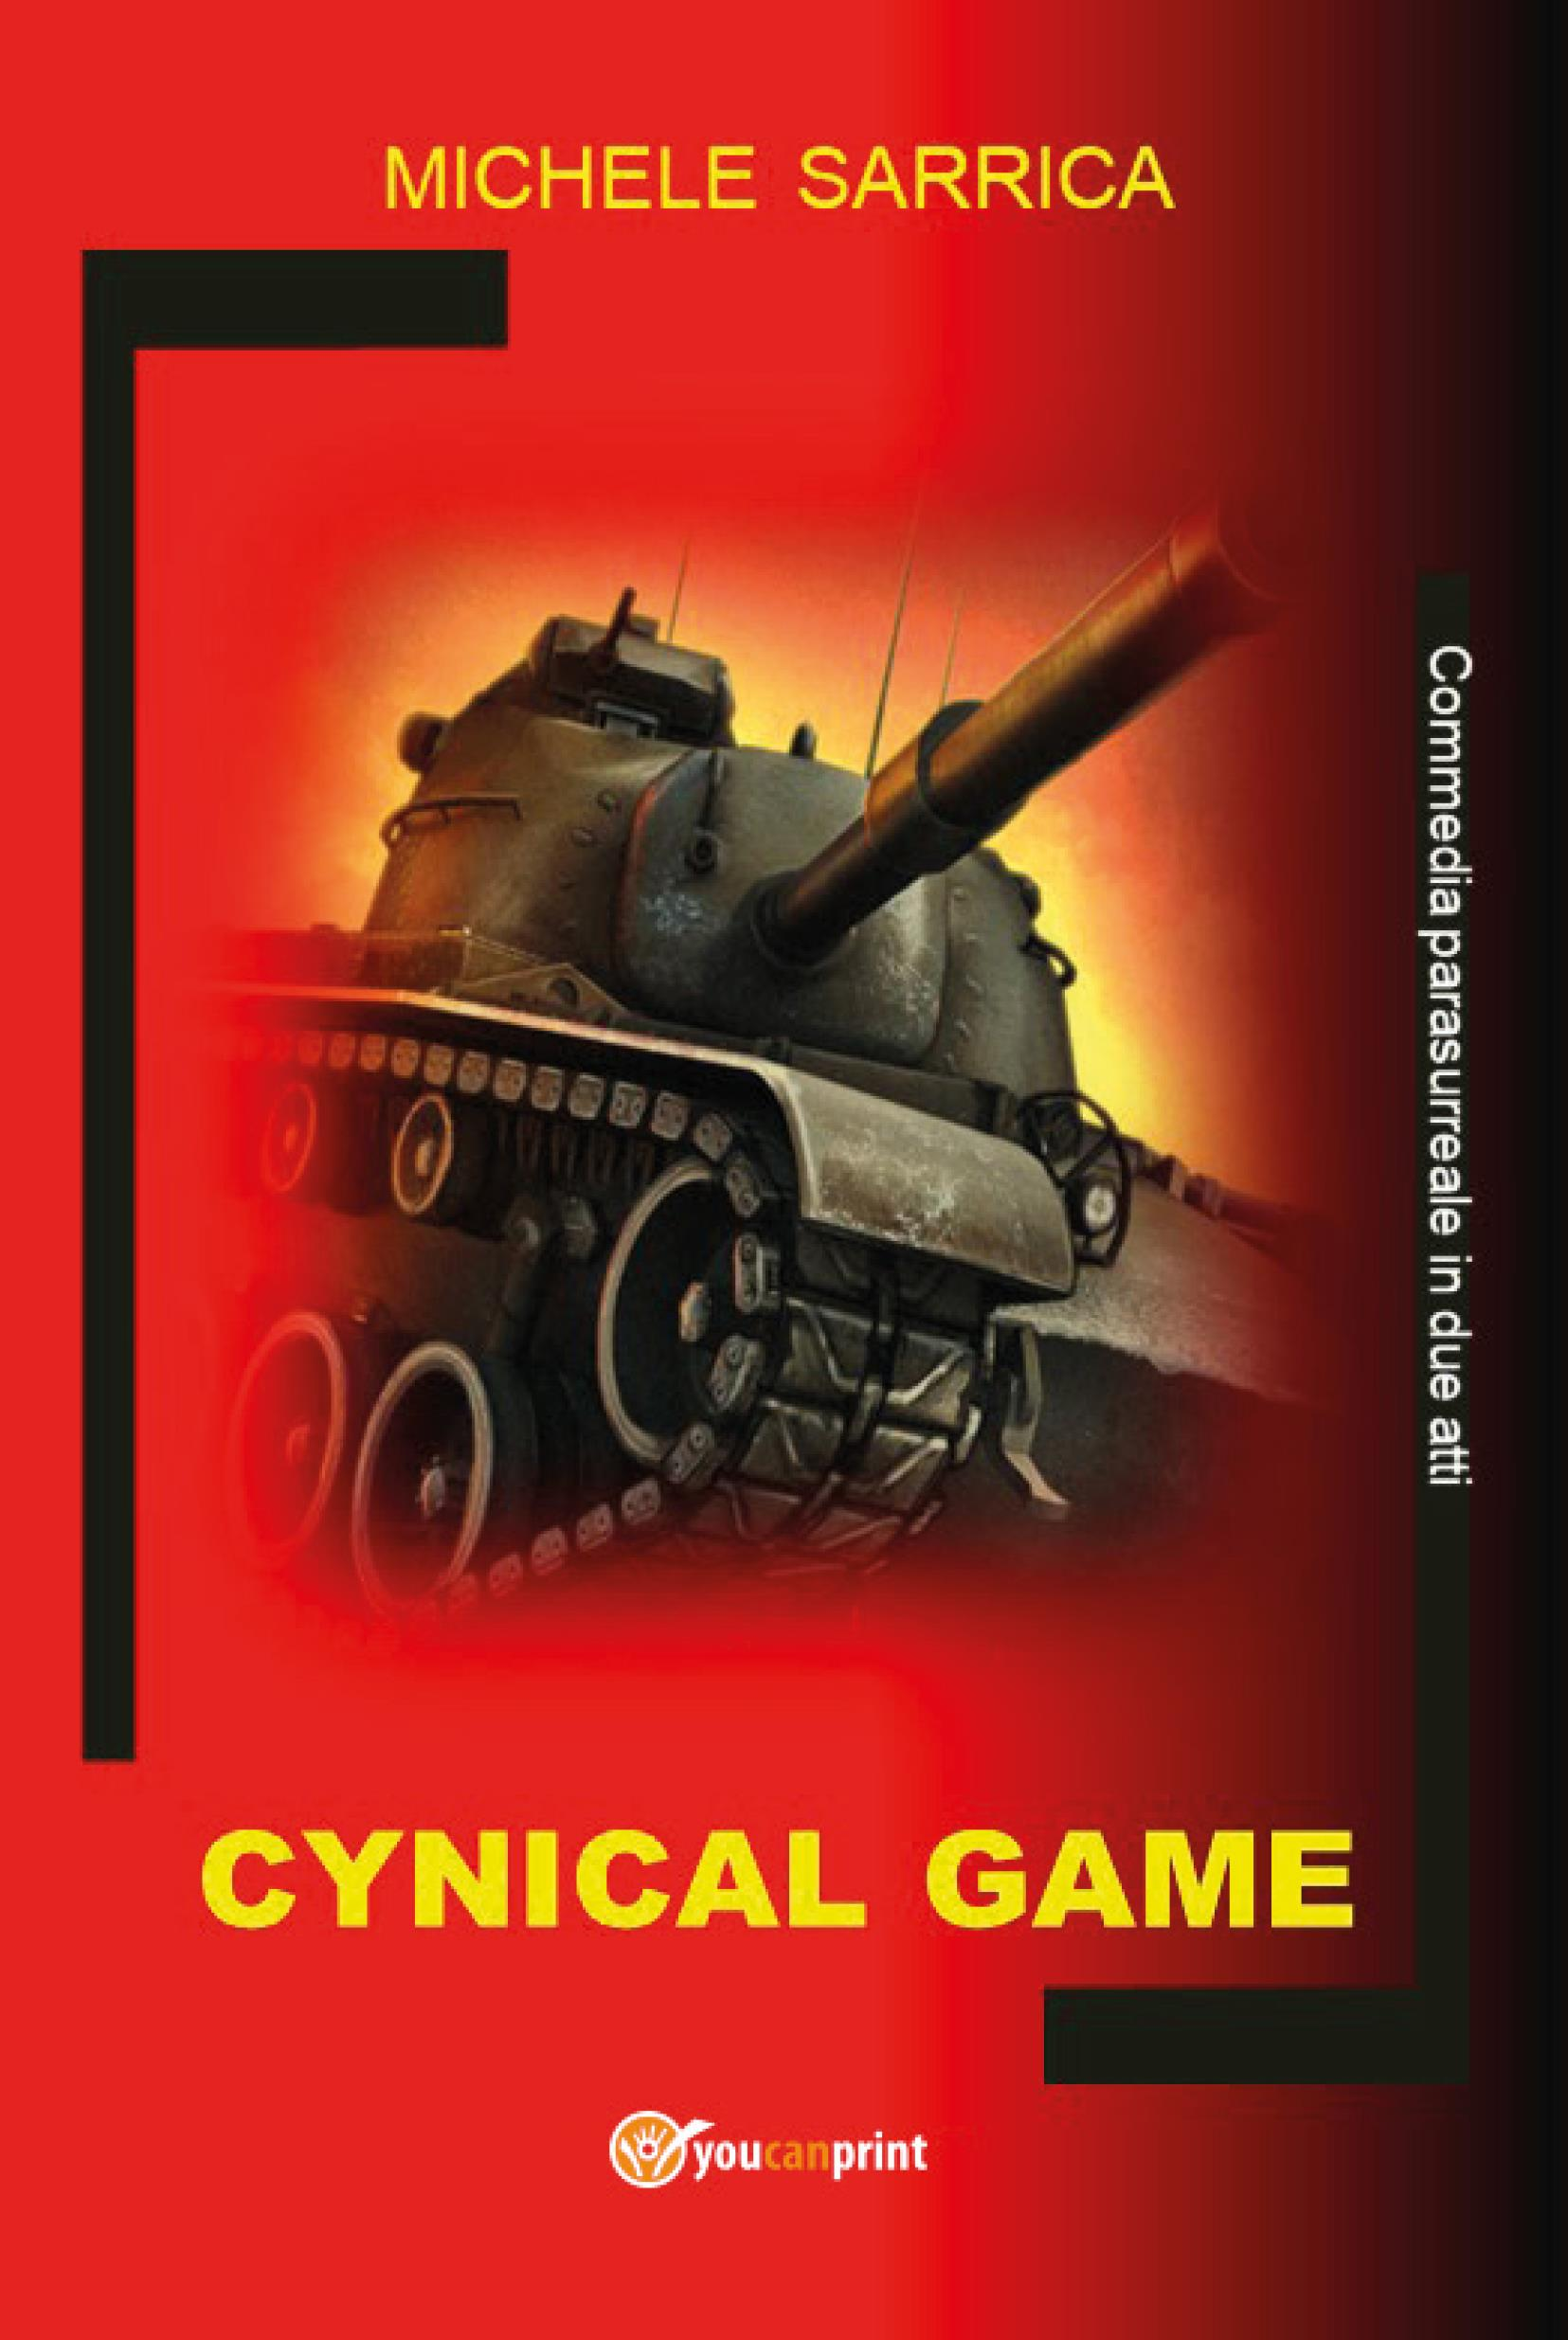 Cynical Game